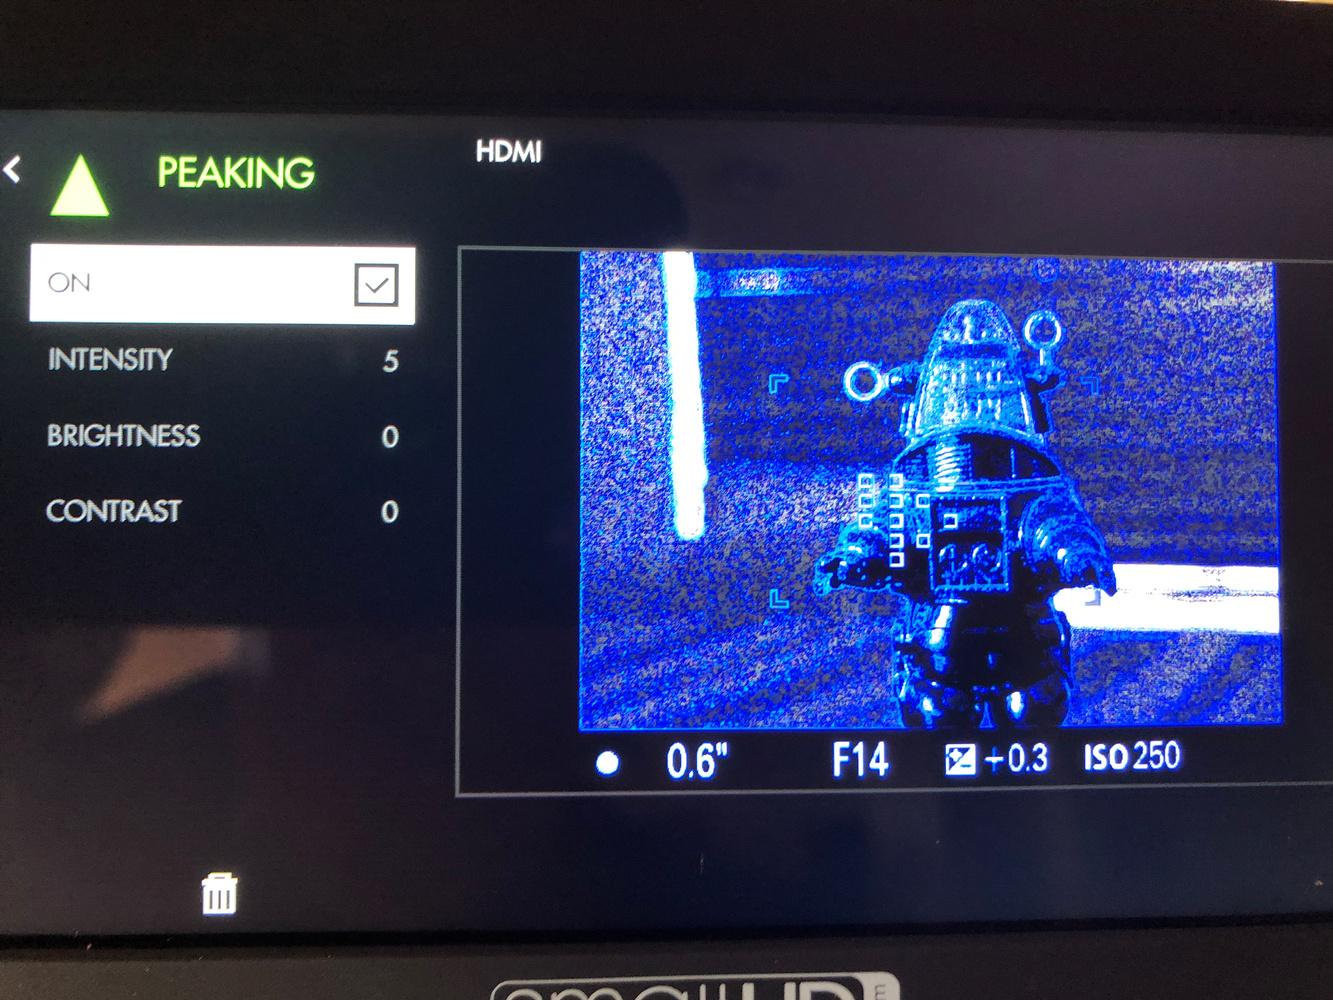 How Useful Is an External Field Monitor for Stills